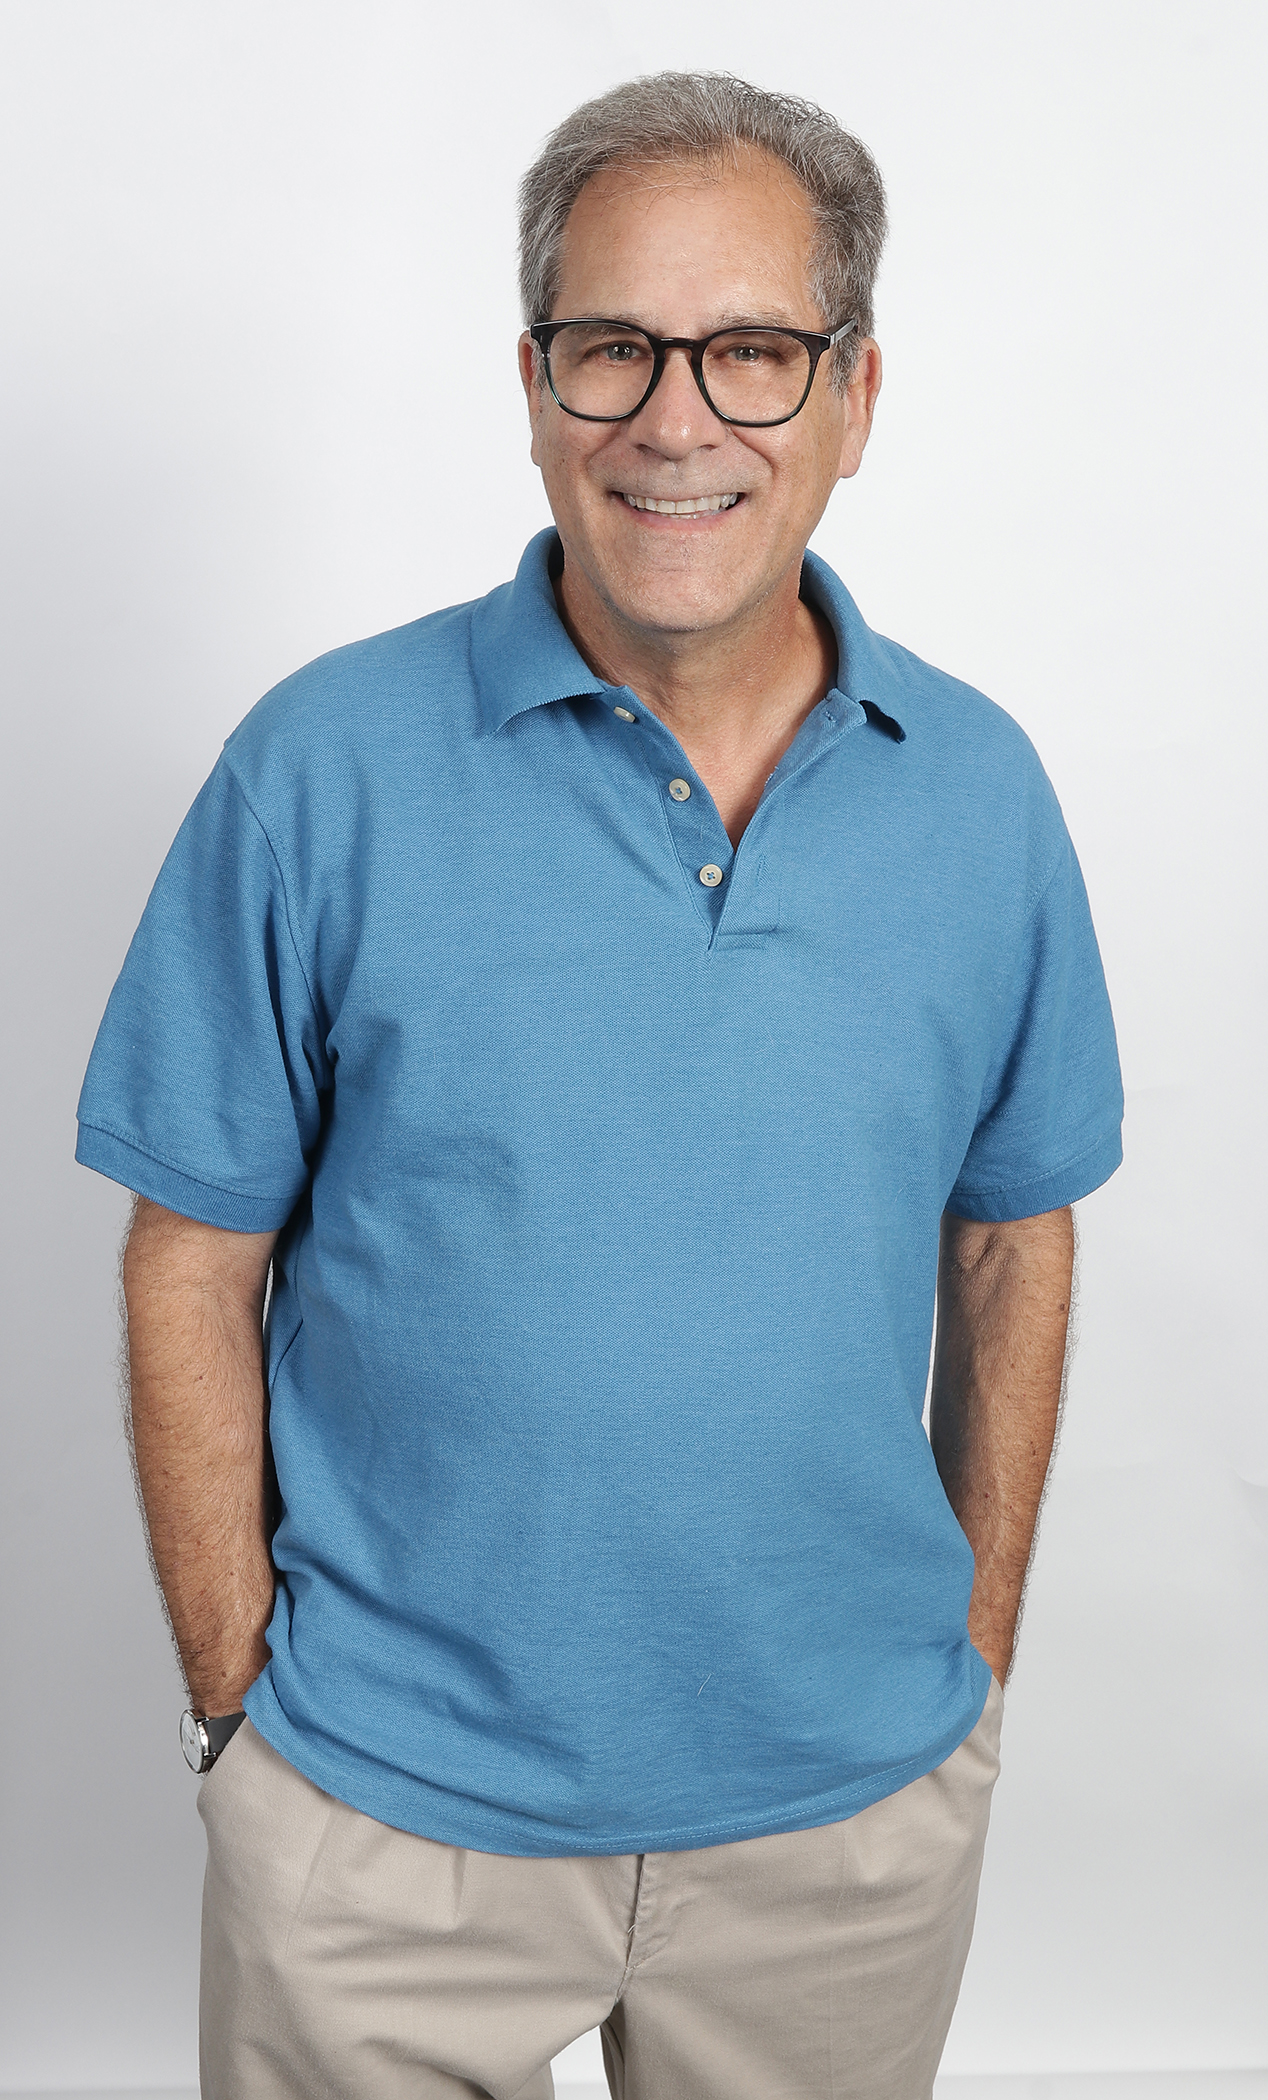 Leon Richman